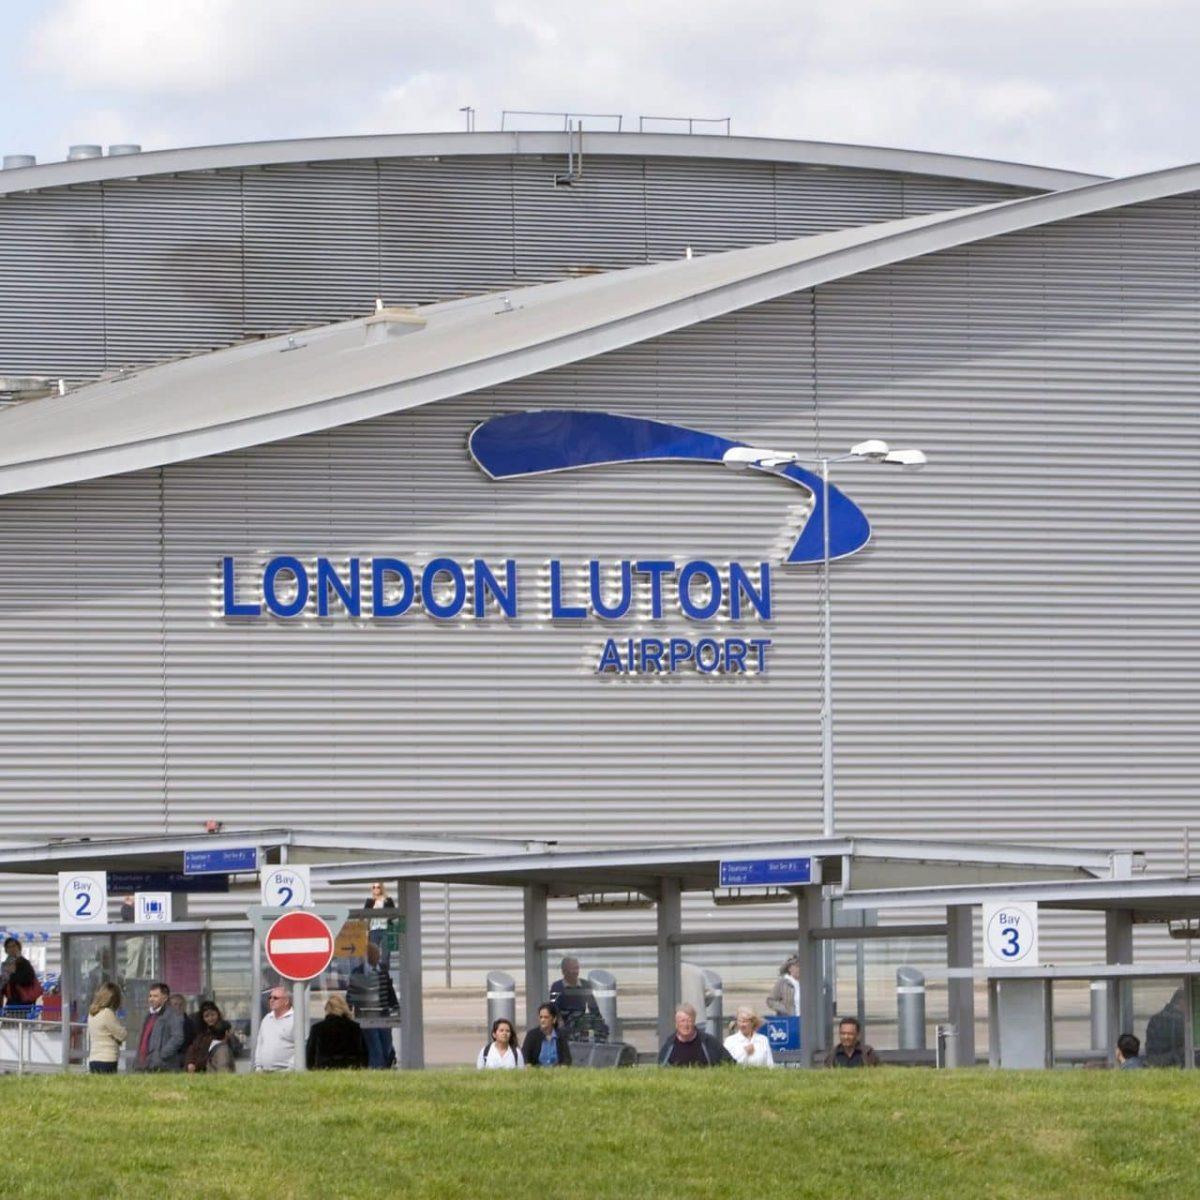 London-Luton